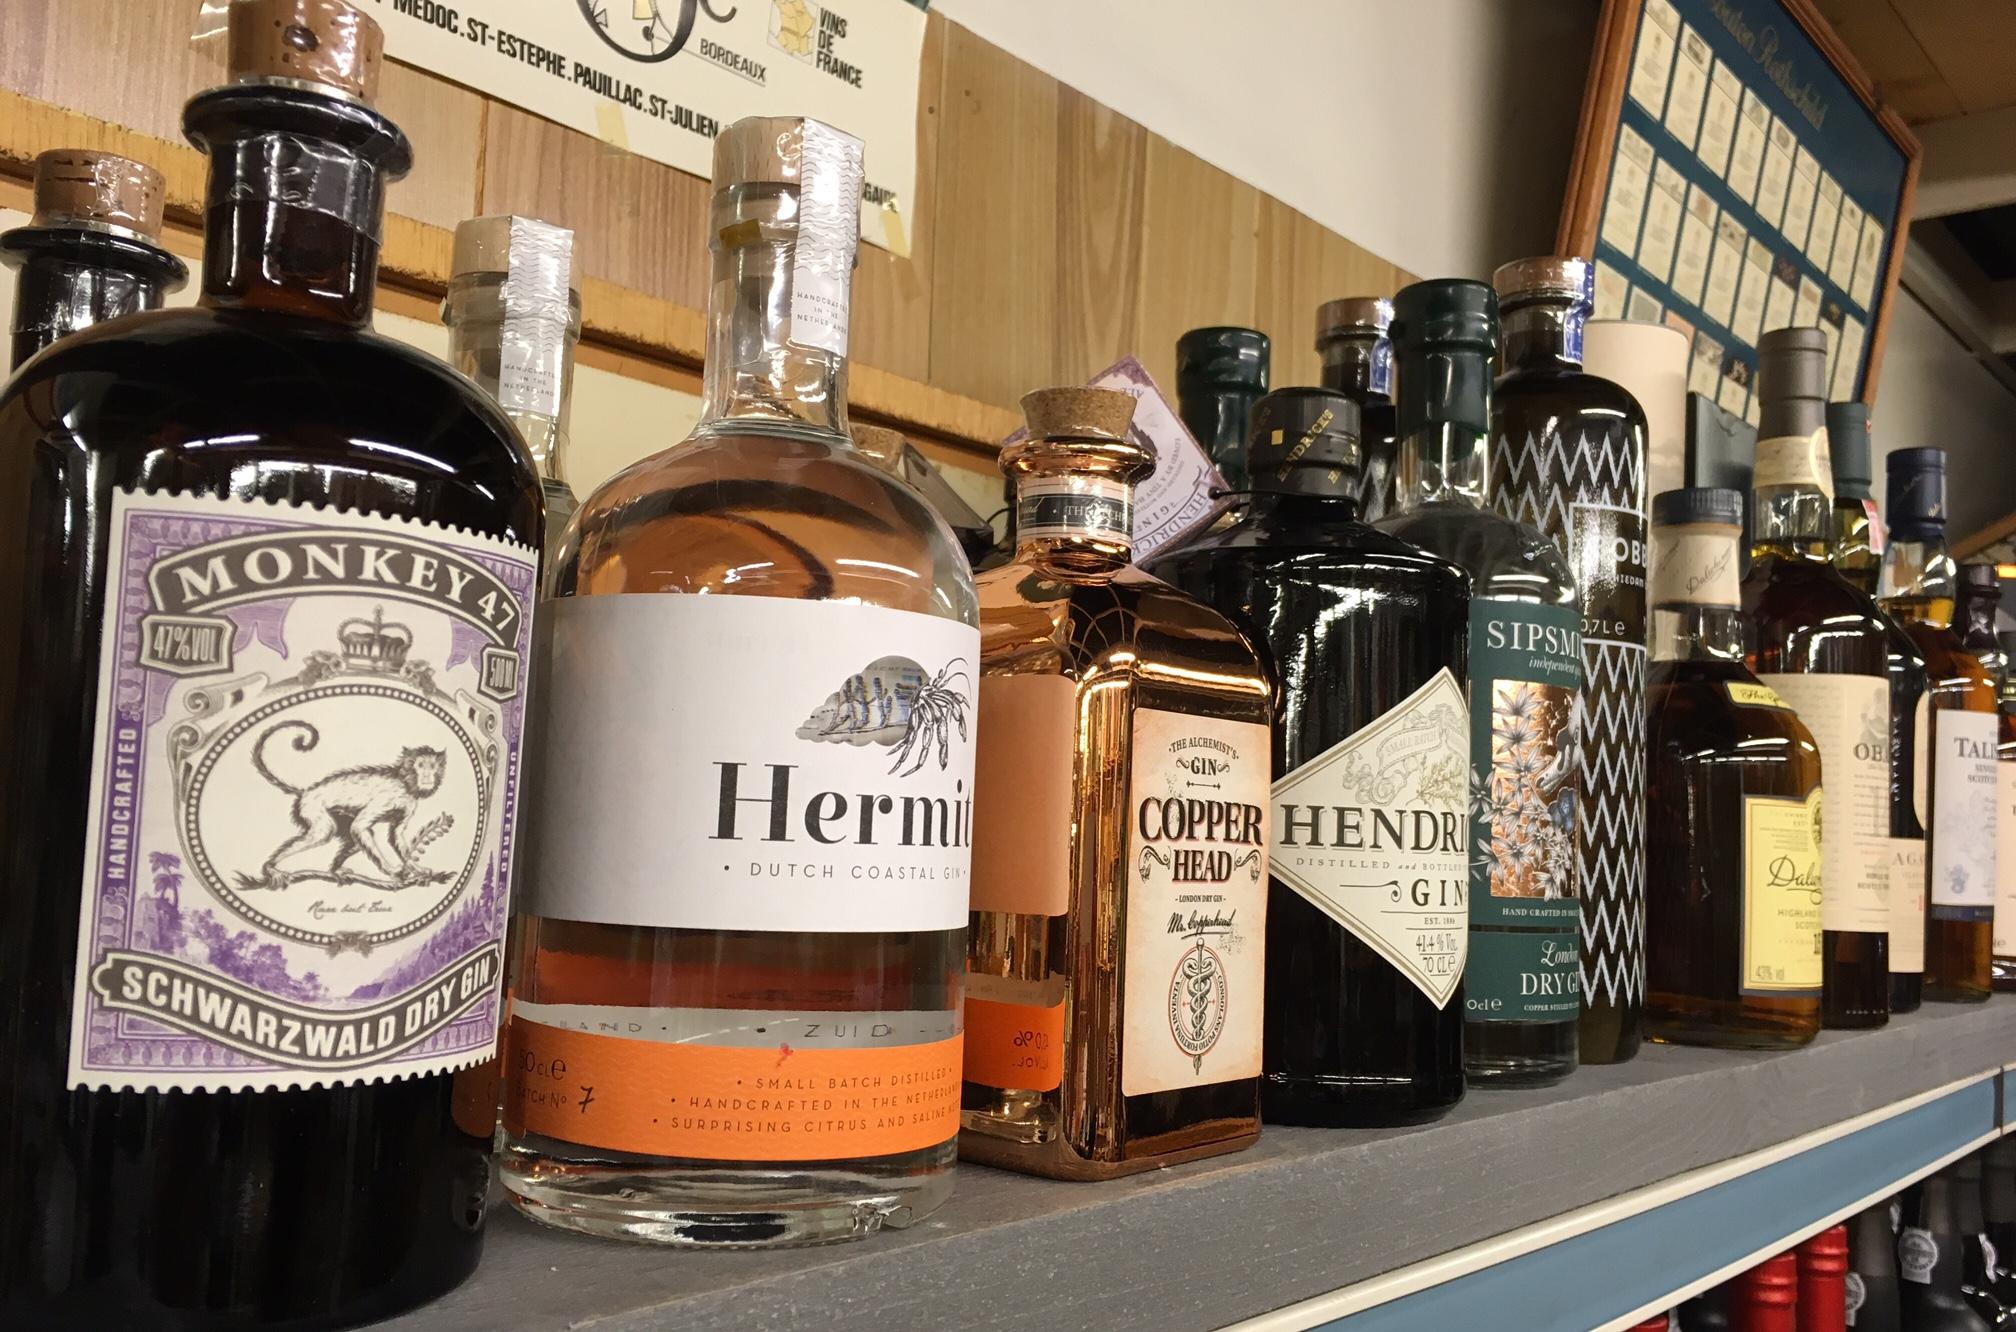 monkey 47, hermit, gin, copperhead, hendrick